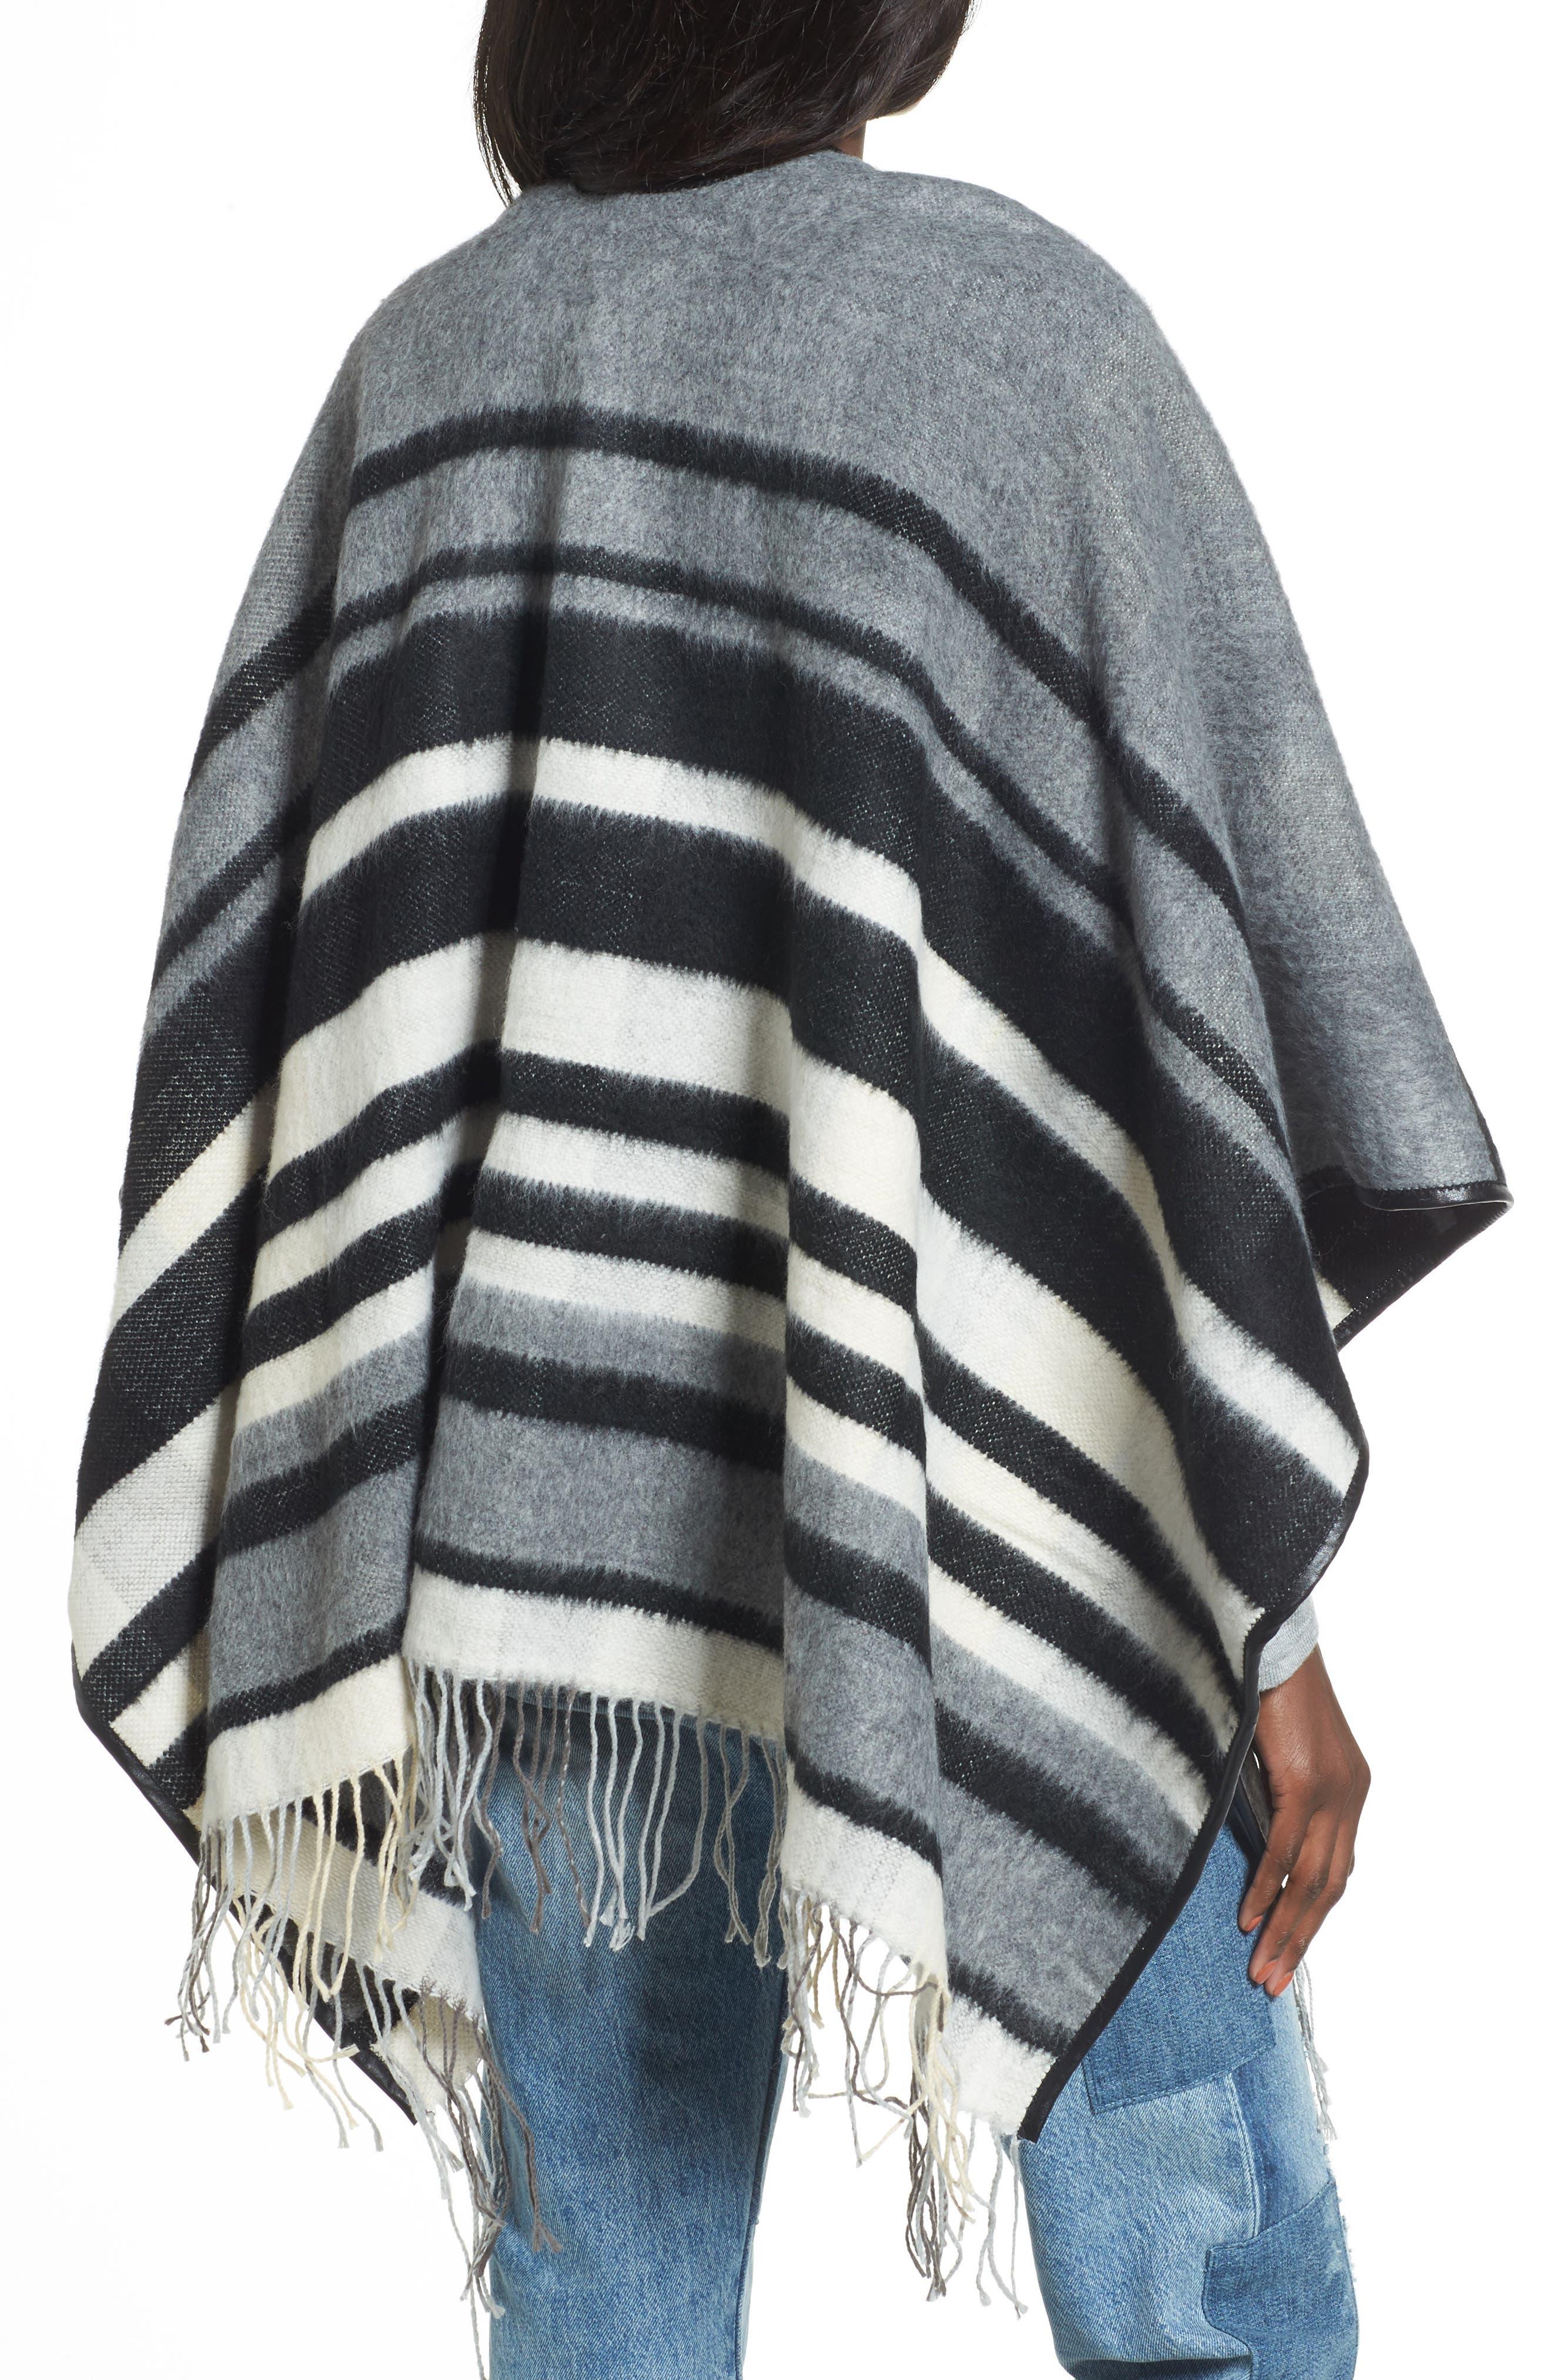 Accessory Collective Stripe Ruana,                             Alternate thumbnail 2, color,                             Black/ Grey